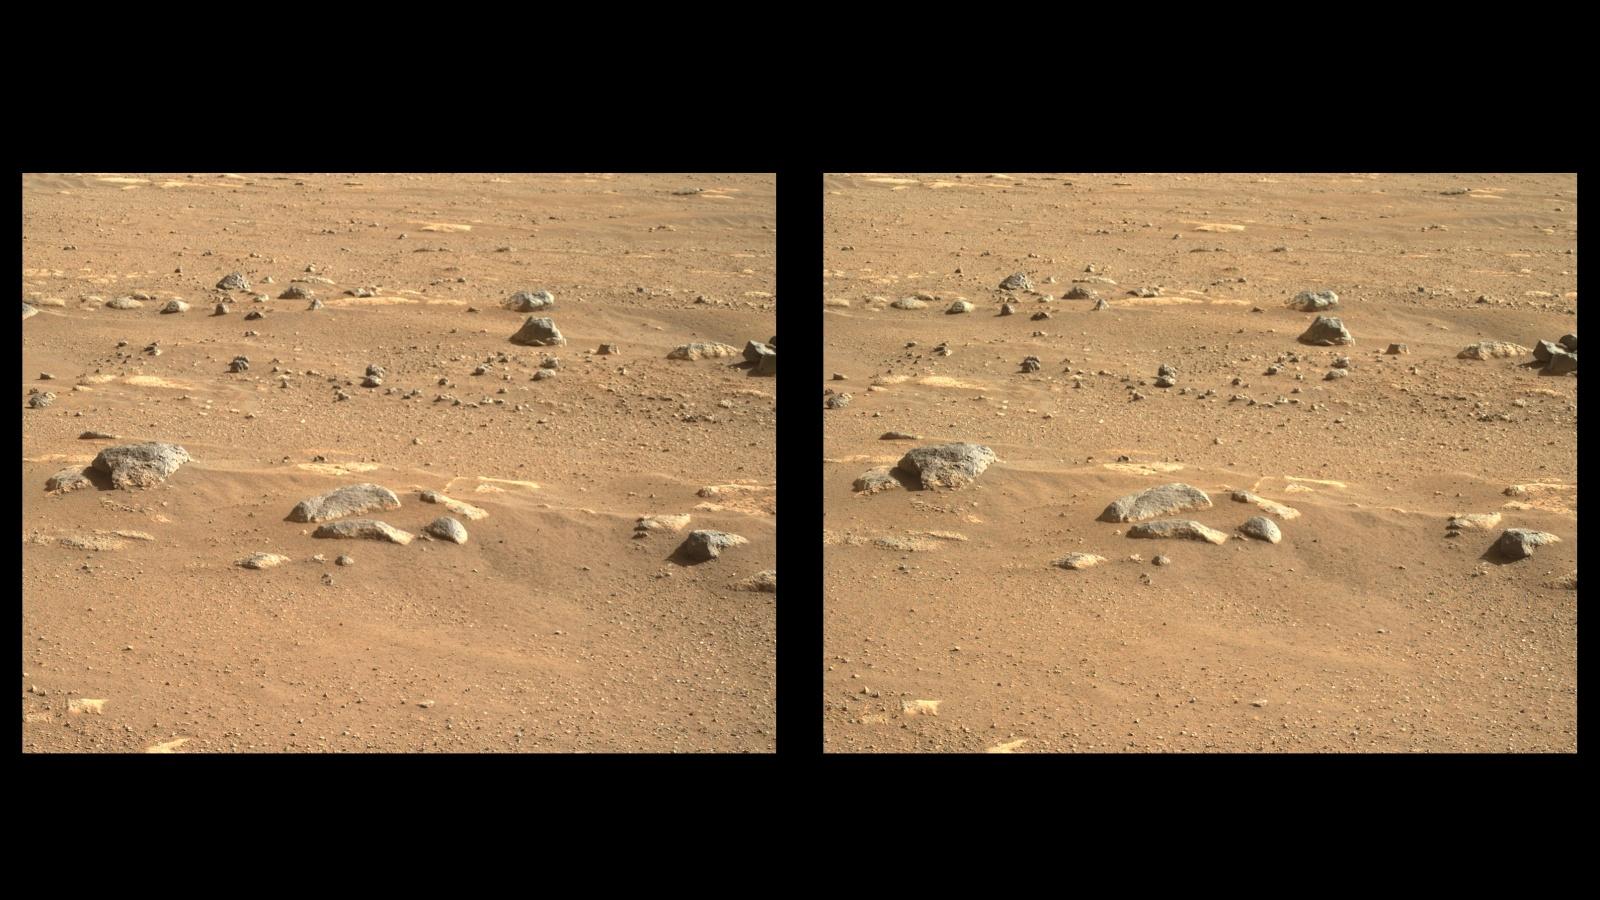 3D-Mars_Perseverance_ZLF_0003_0667217846_000FDR_N0010052AUT_04096_034085J01.jpg